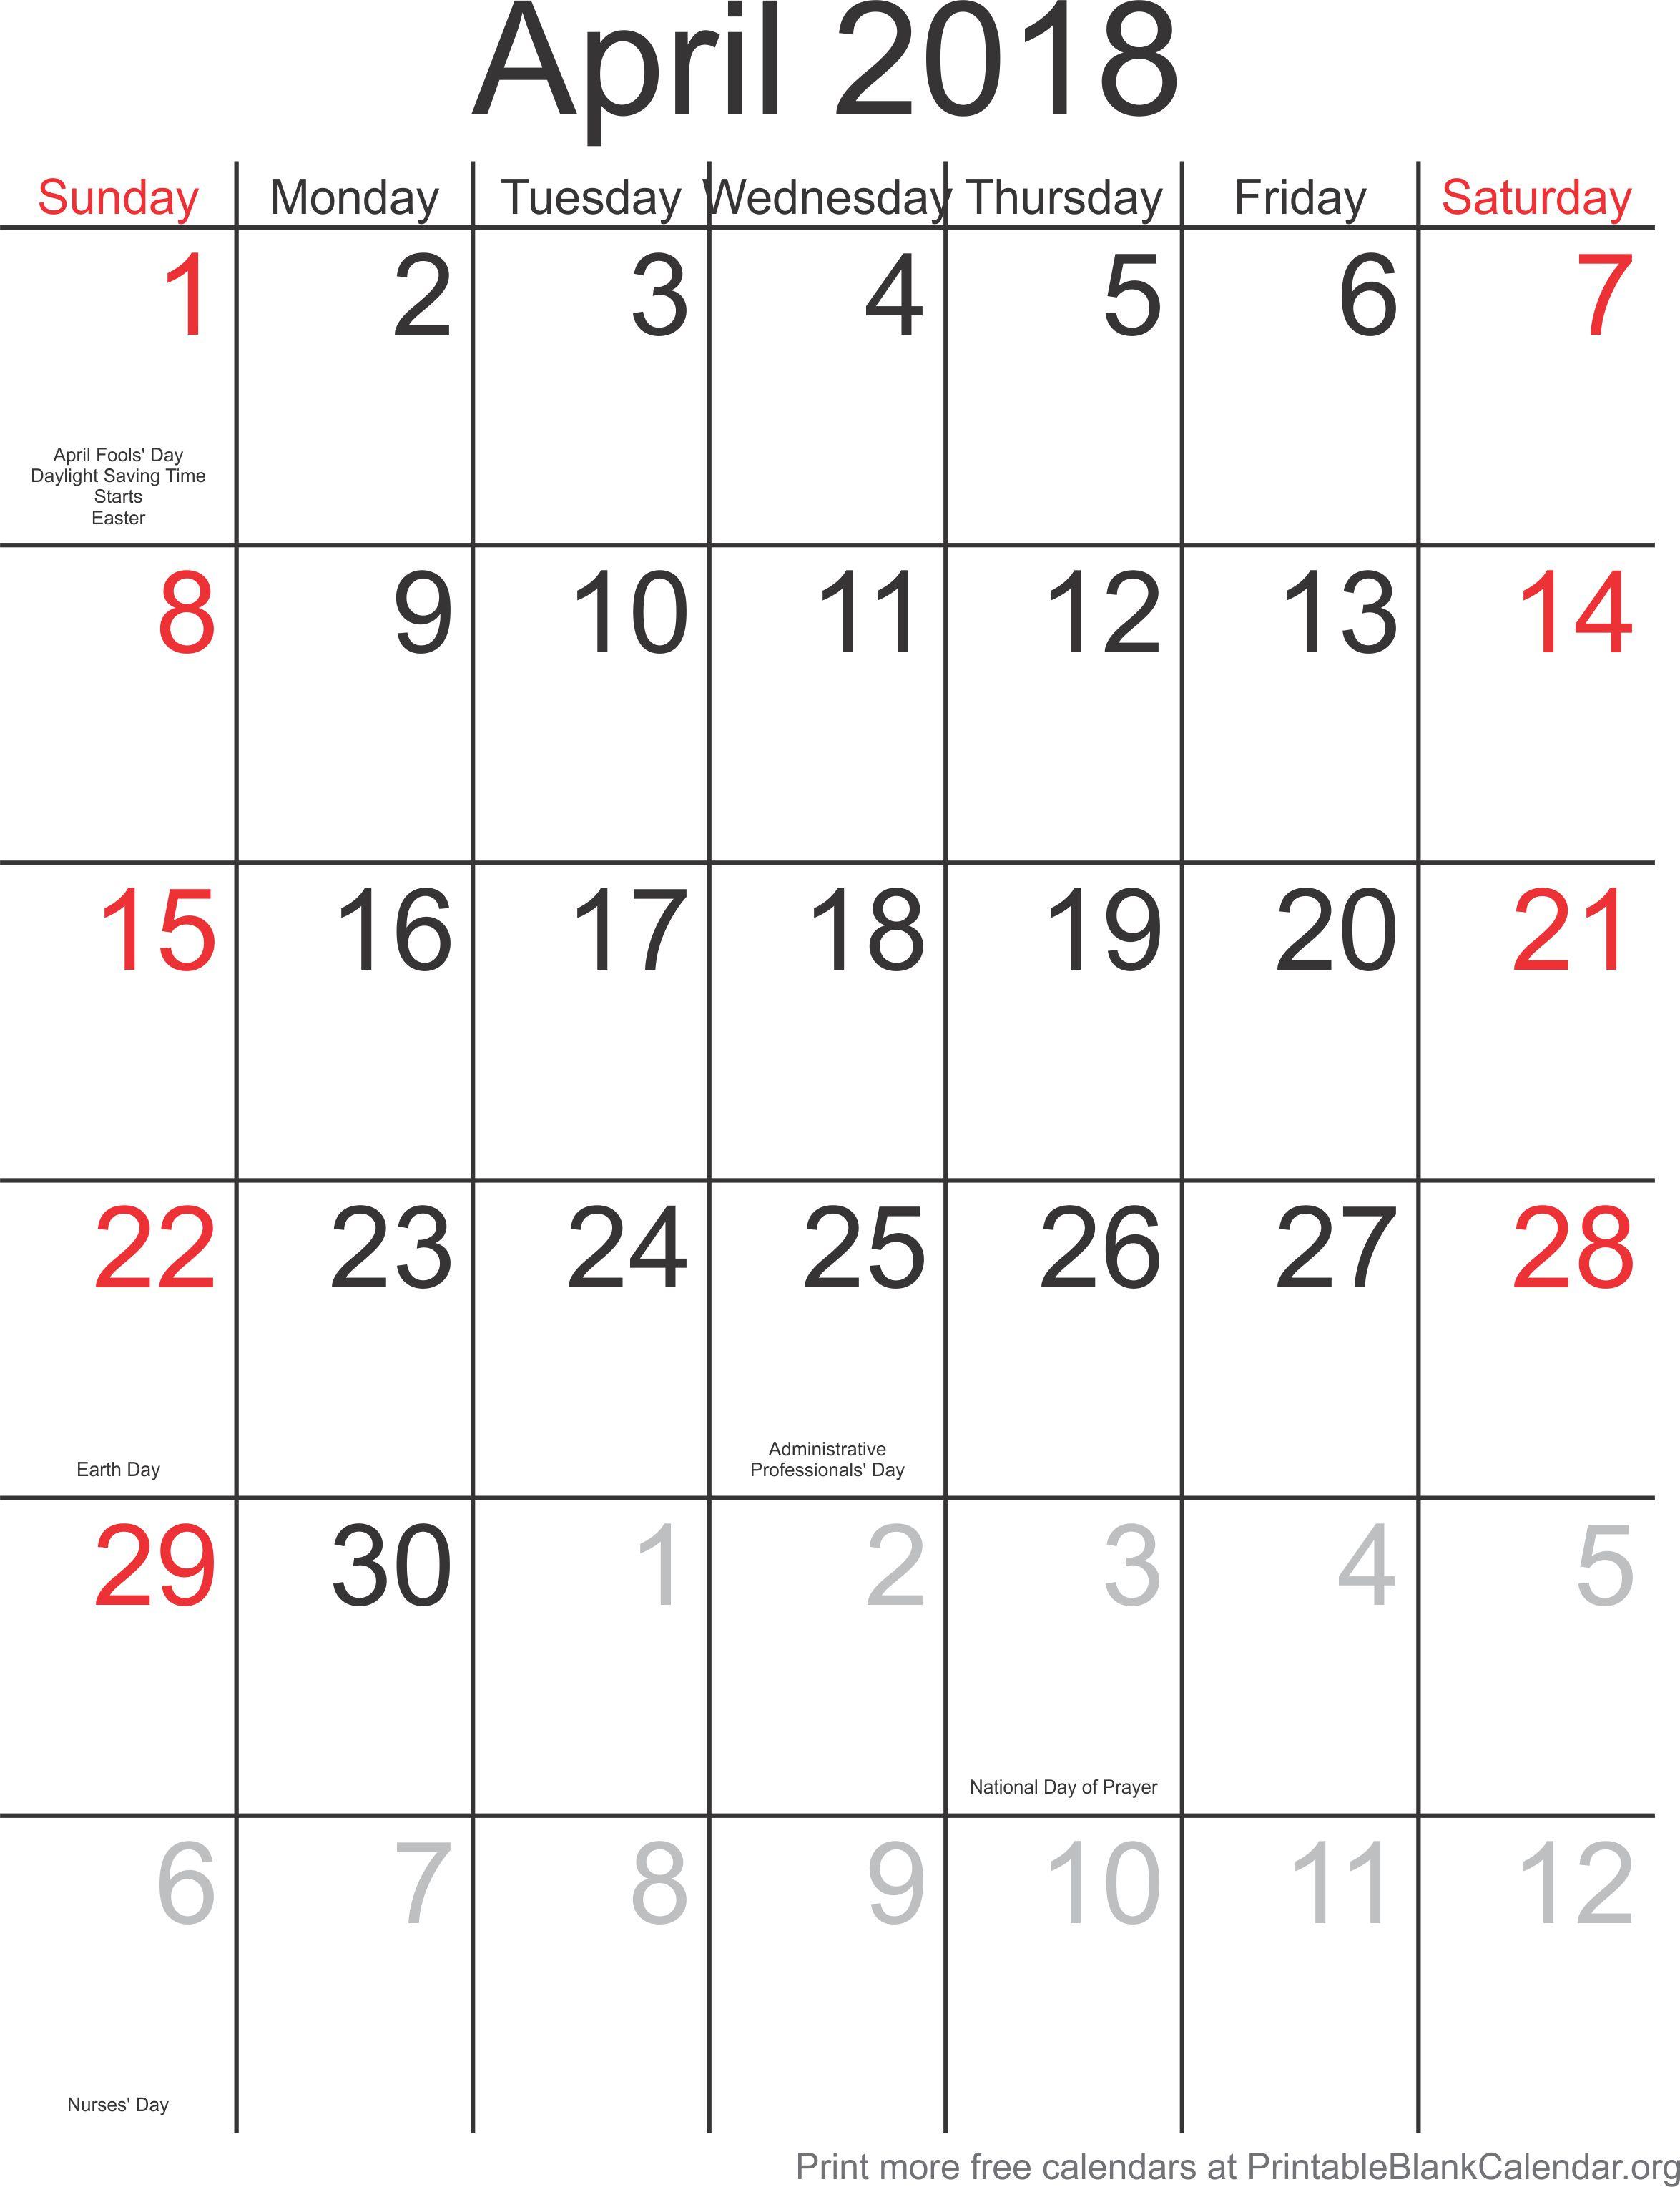 April 2018 Printable Calendar Template Printable Blank Calendar